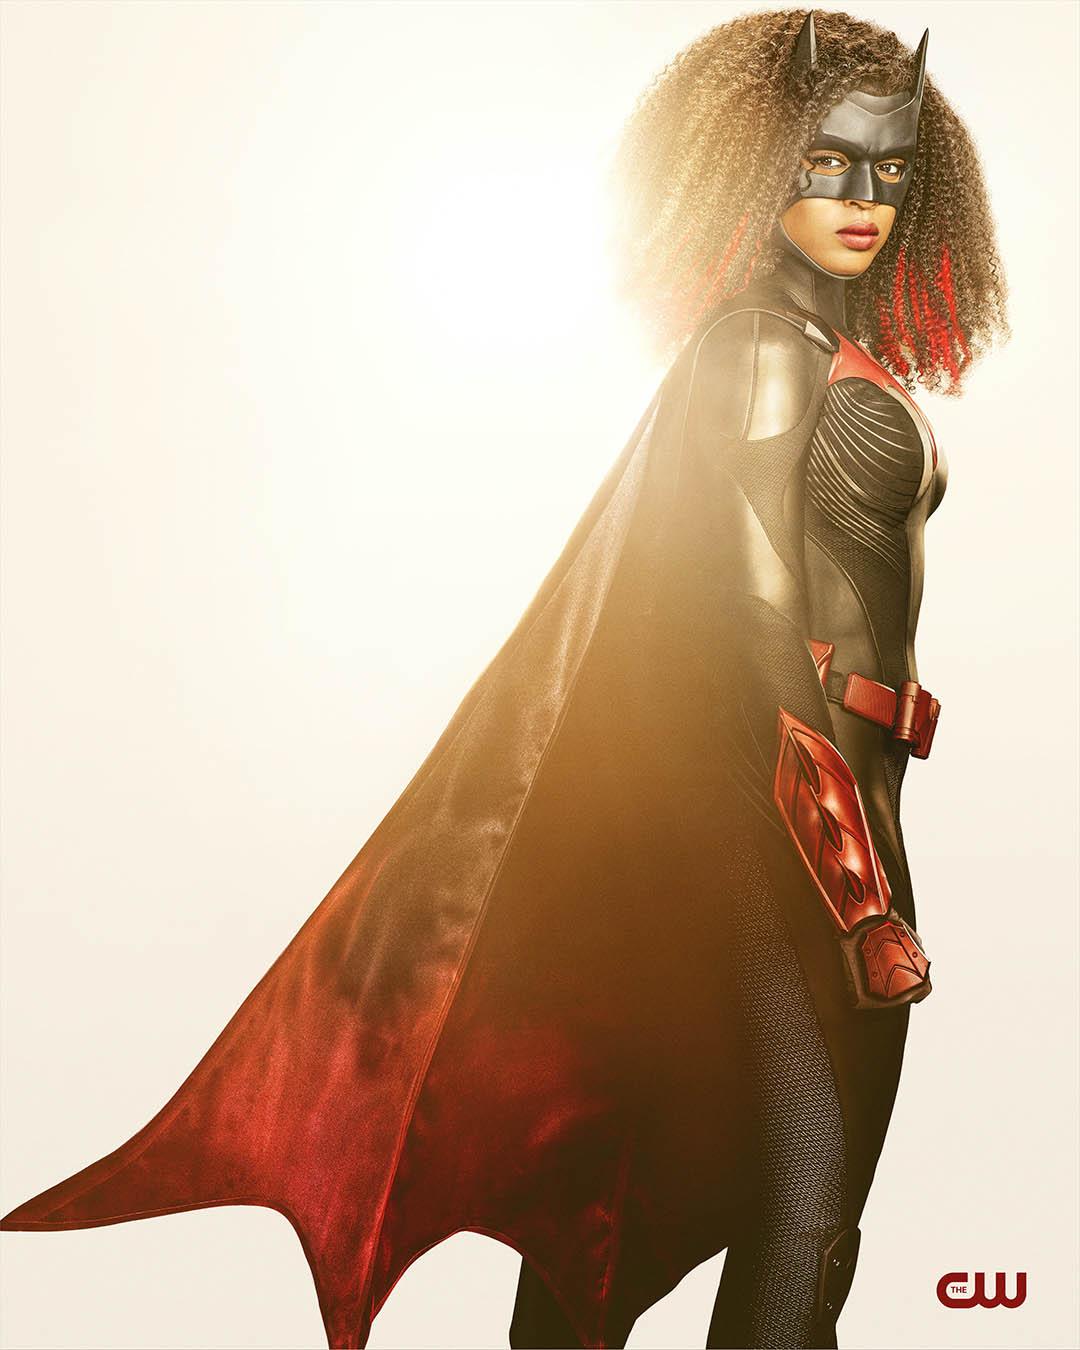 Batwoman: Javicia Leslie First Look